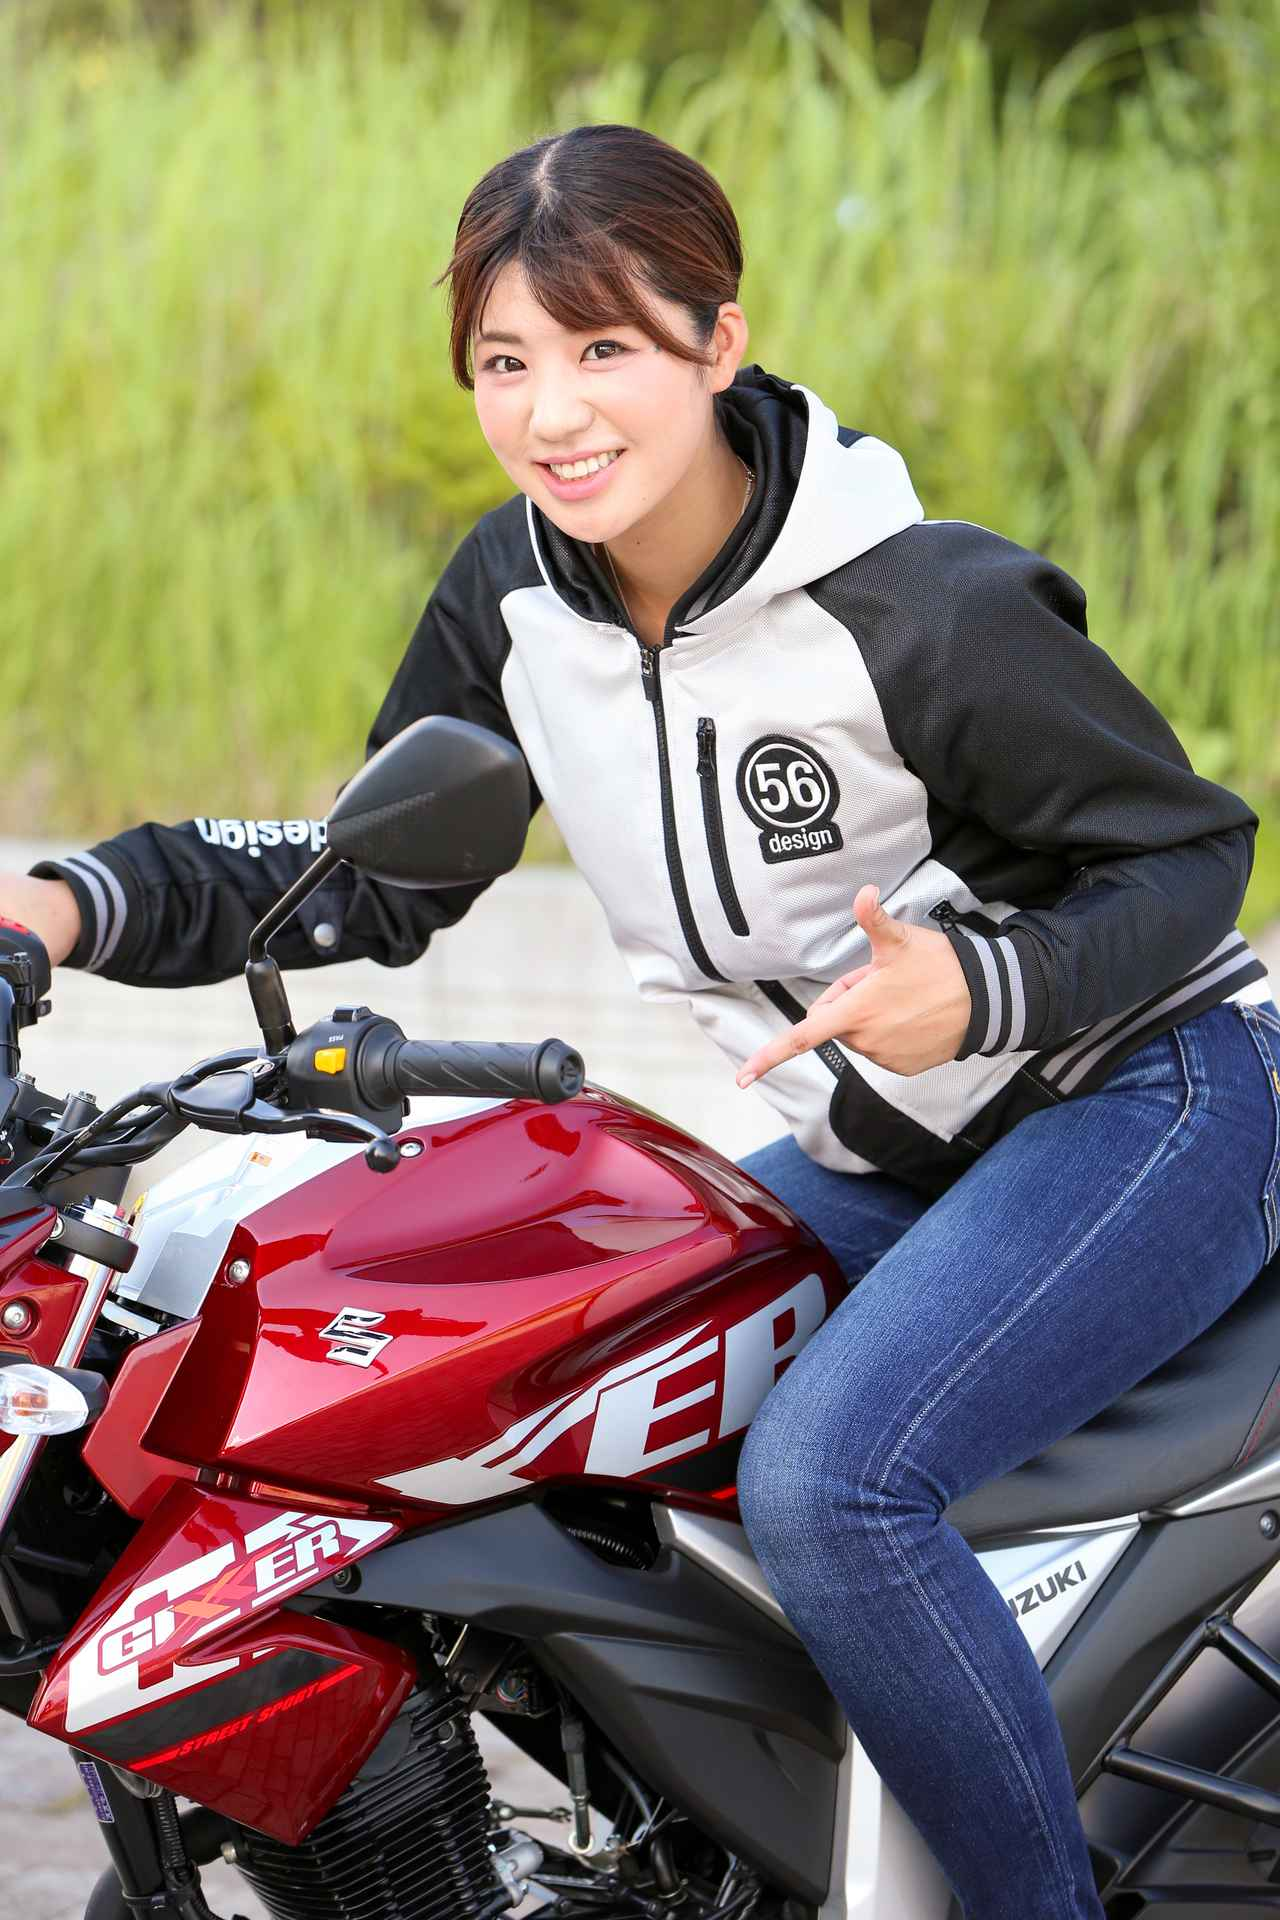 Images : 3番目の画像 - ほぼ月刊「梅本まどかとオートバイ」vol.20 SUZUKI GIXXER - webオートバイ